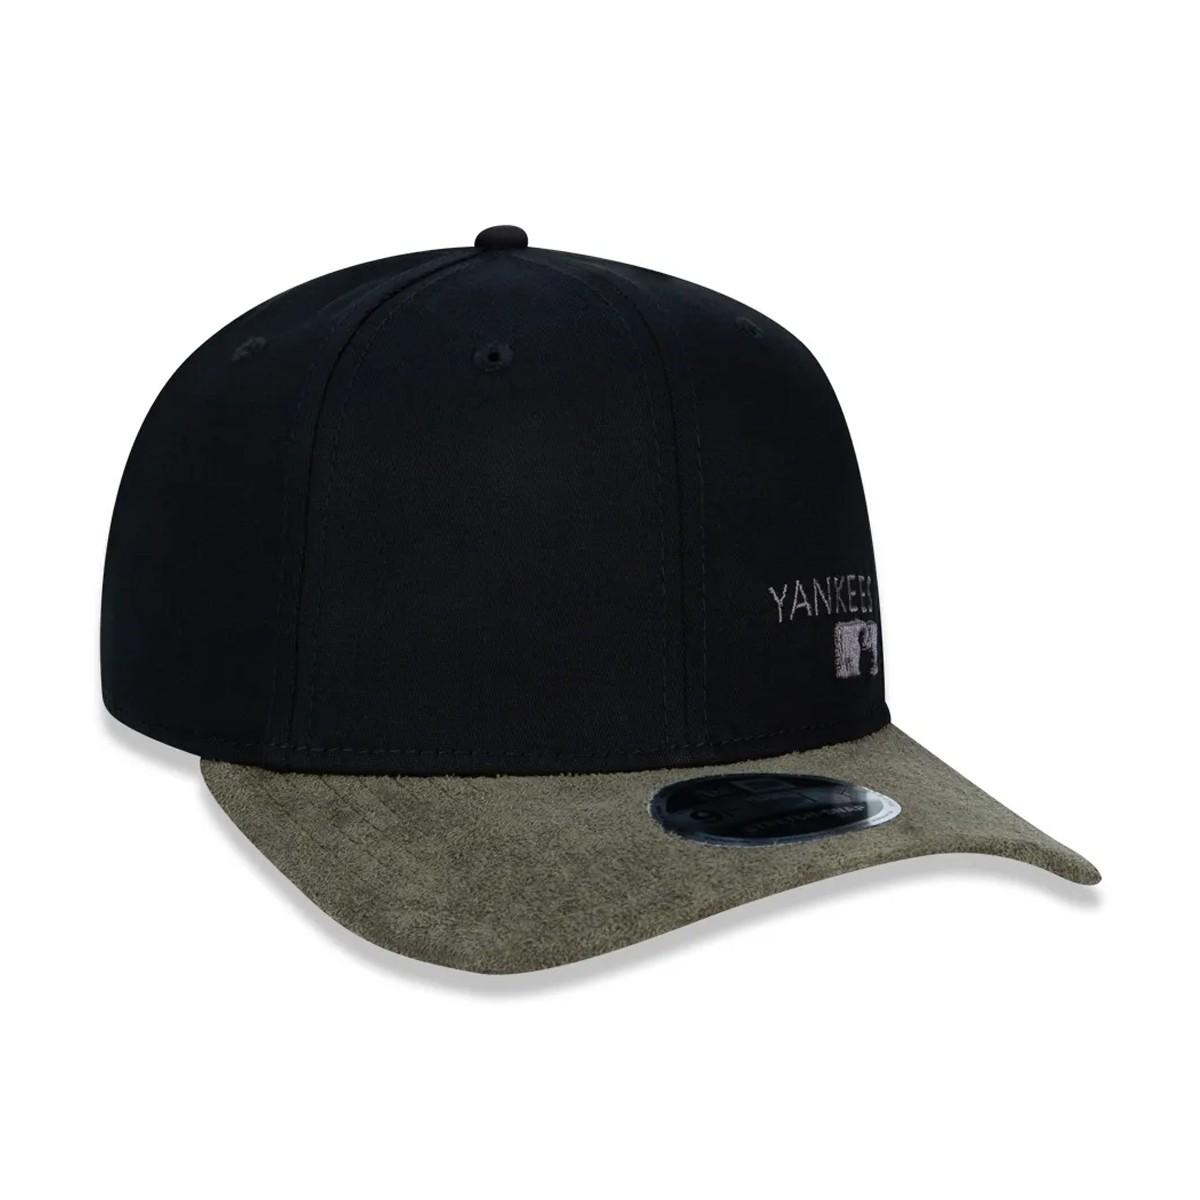 Boné New Era Yankees Fashion Team Confort Black